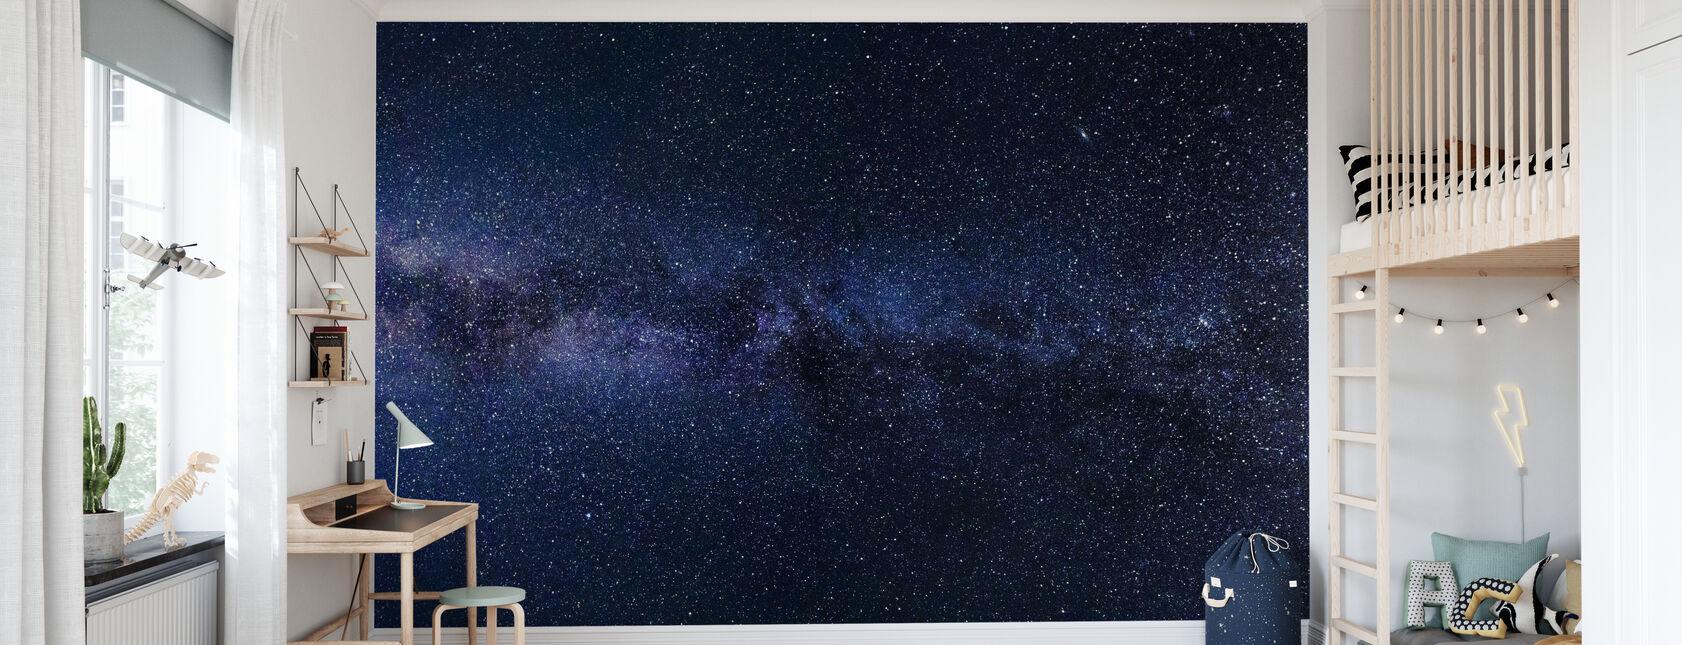 Mystical Starry Sky - Wallpaper - Kids Room